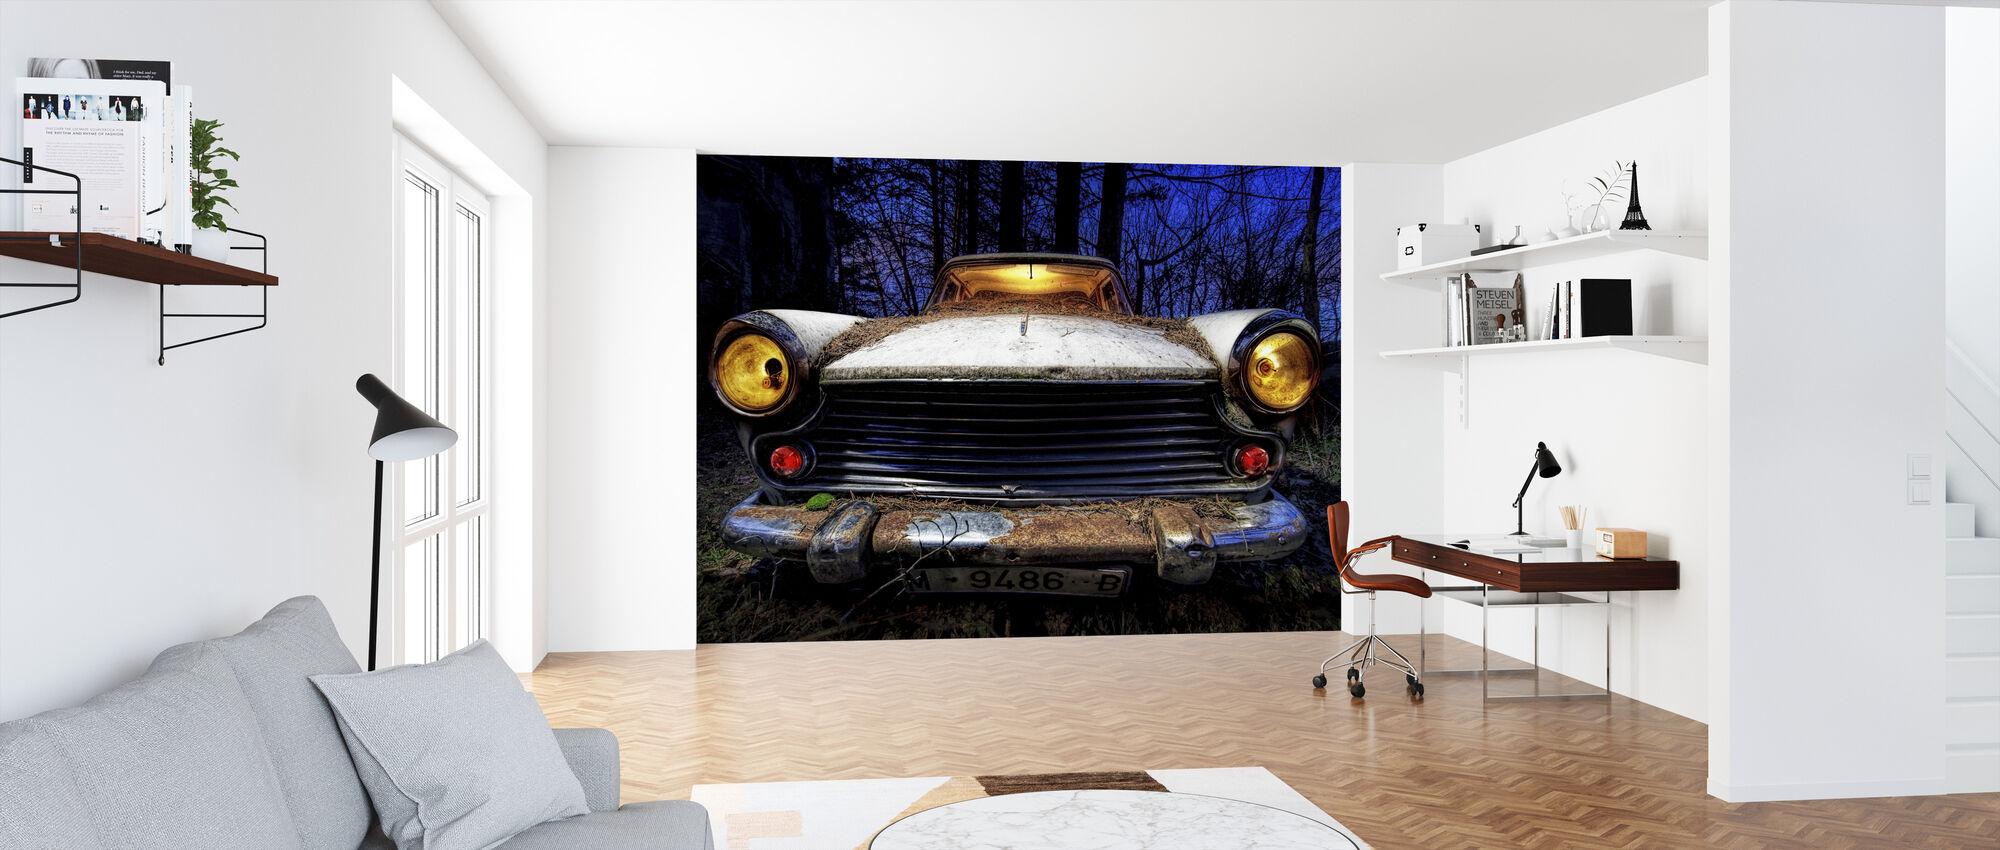 Morris - Wallpaper - Office